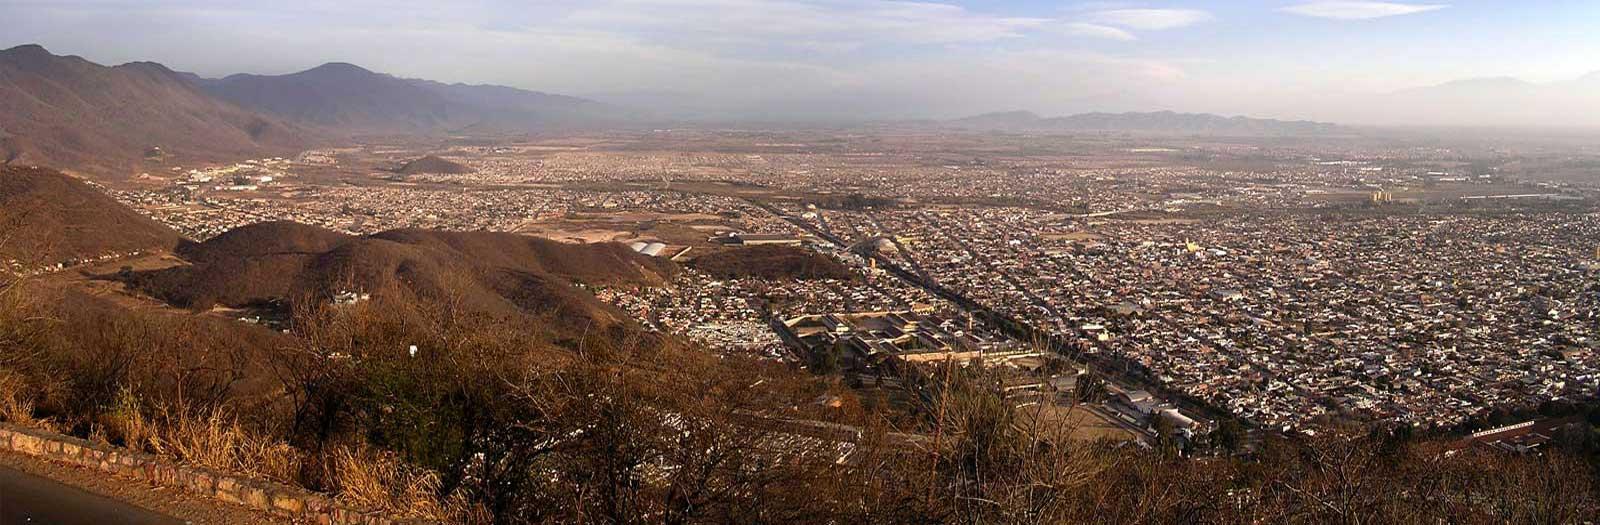 Vista de la Ciudad de Salta, Cerro San Bernardo, Salta